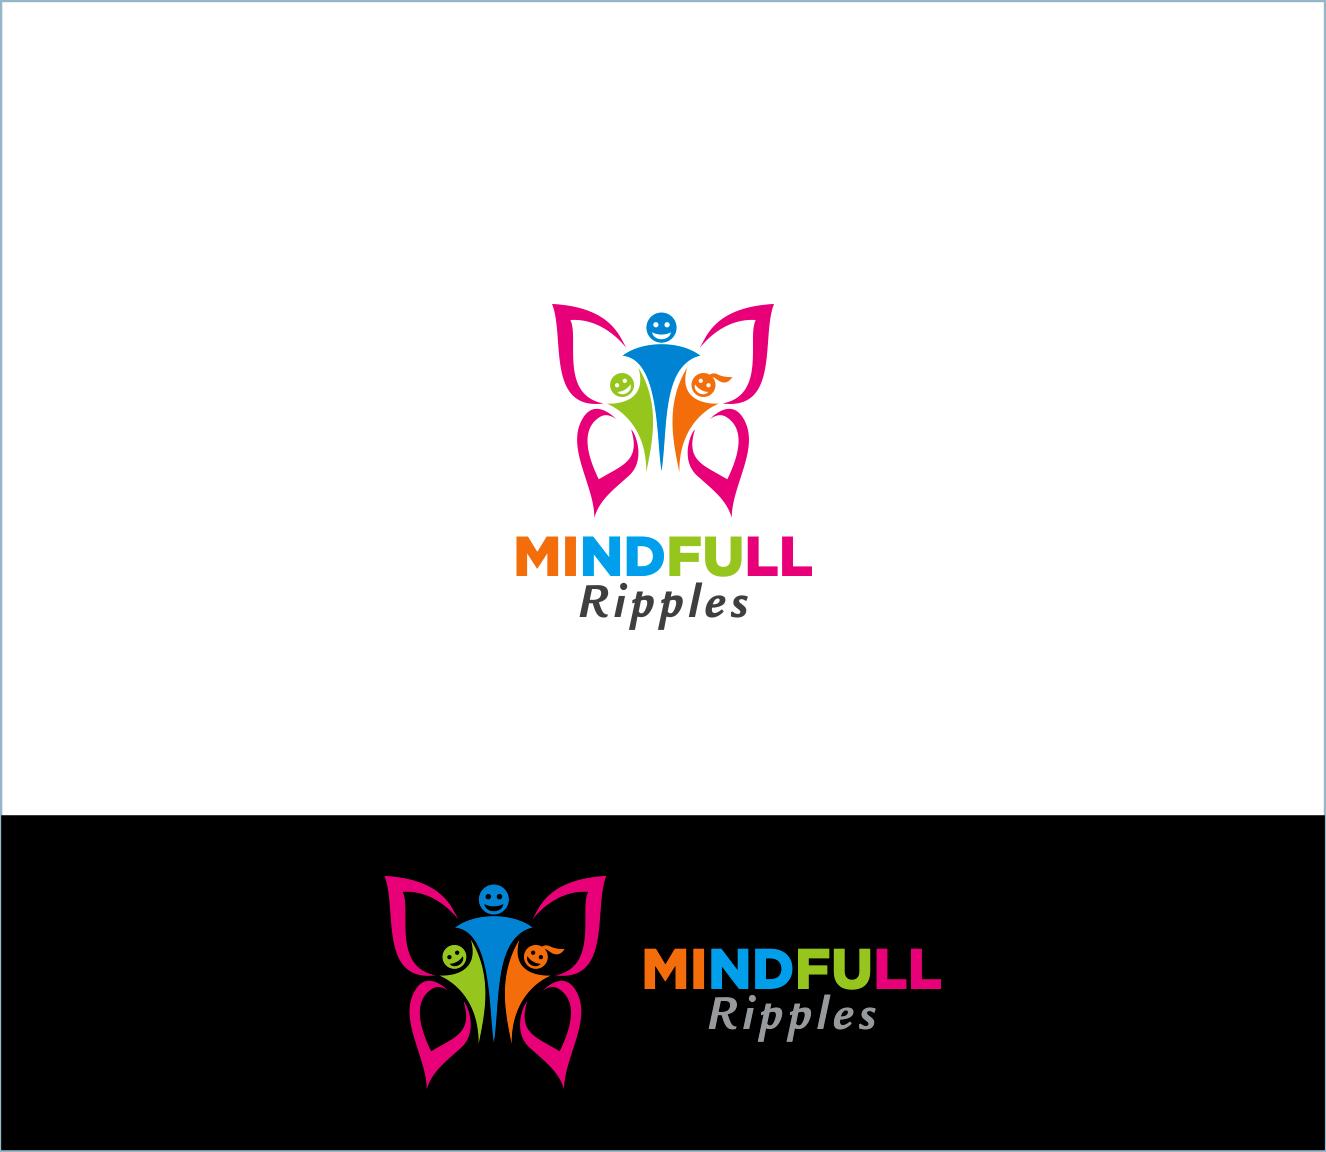 Logo Design by Armada Jamaluddin - Entry No. 27 in the Logo Design Contest Mindful Ripples Logo Design.